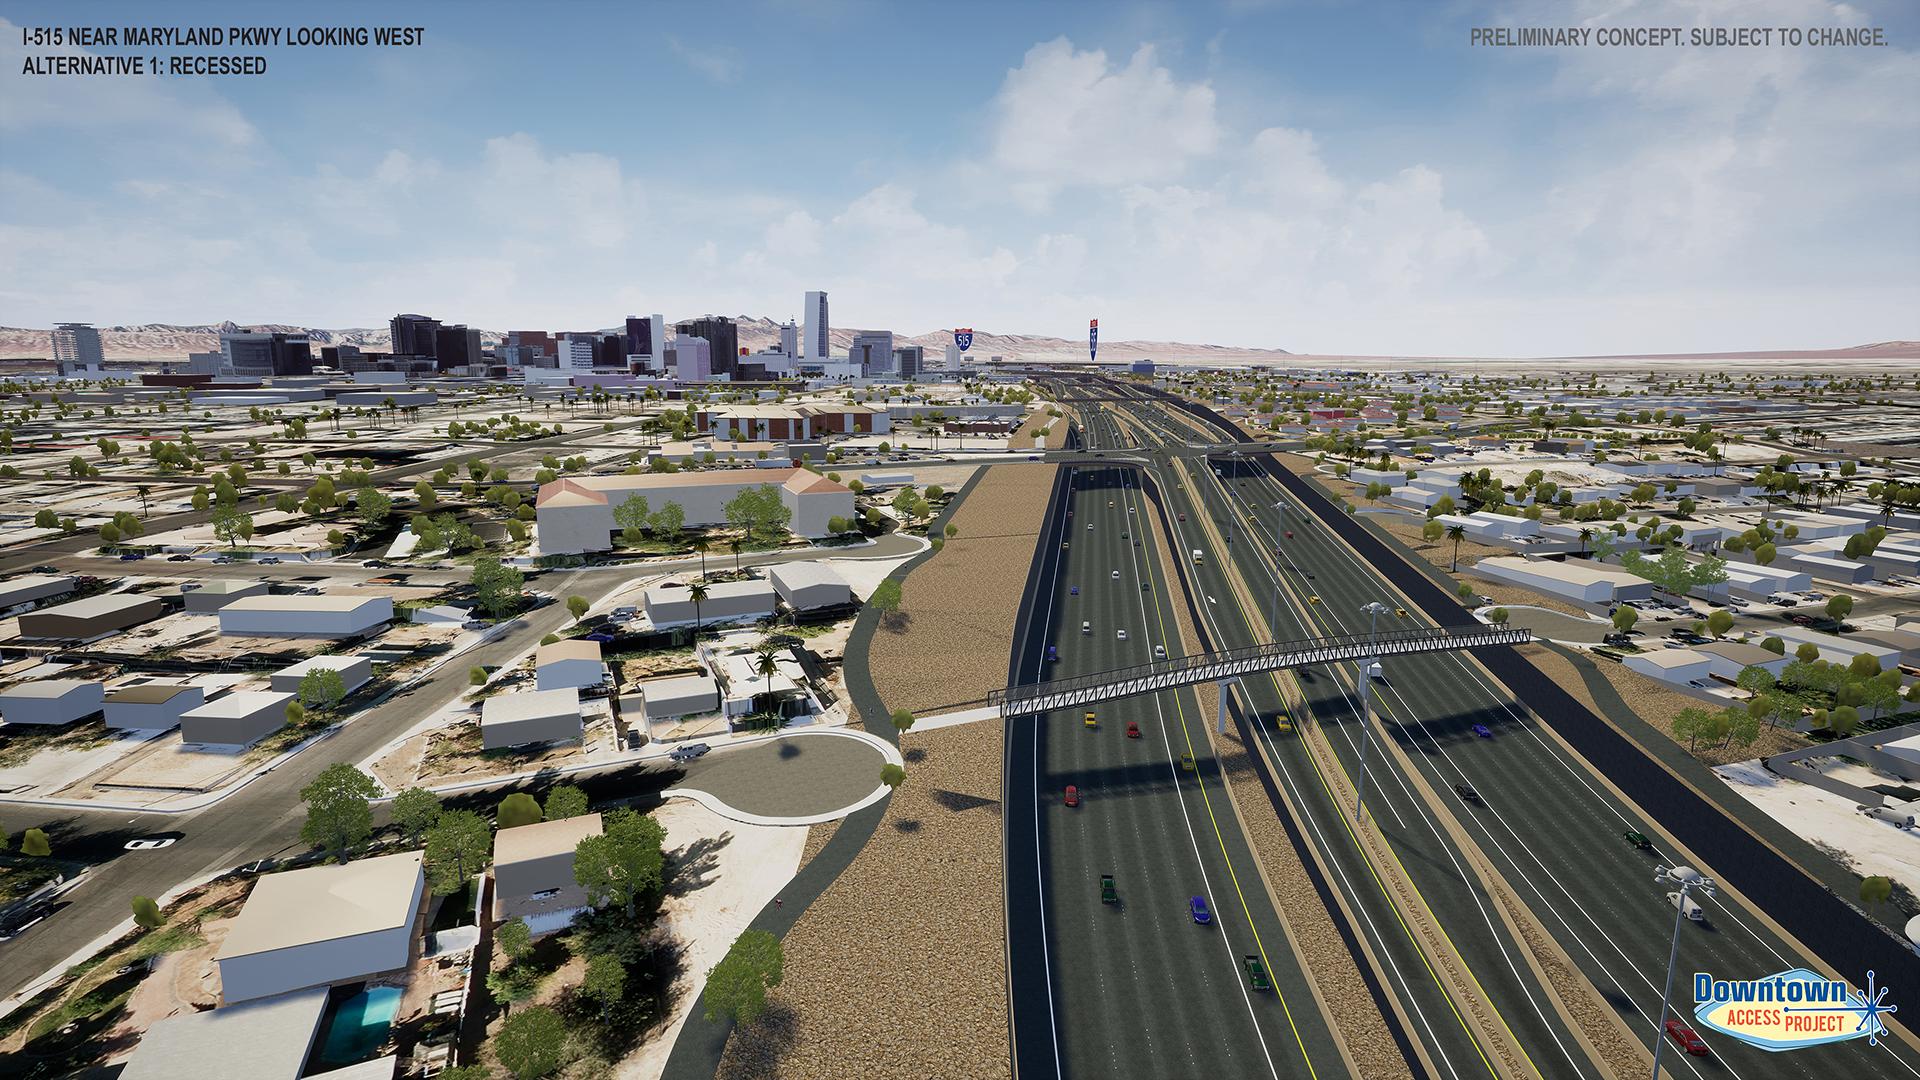 I-515 near maryland parkway alternative 1 rendering